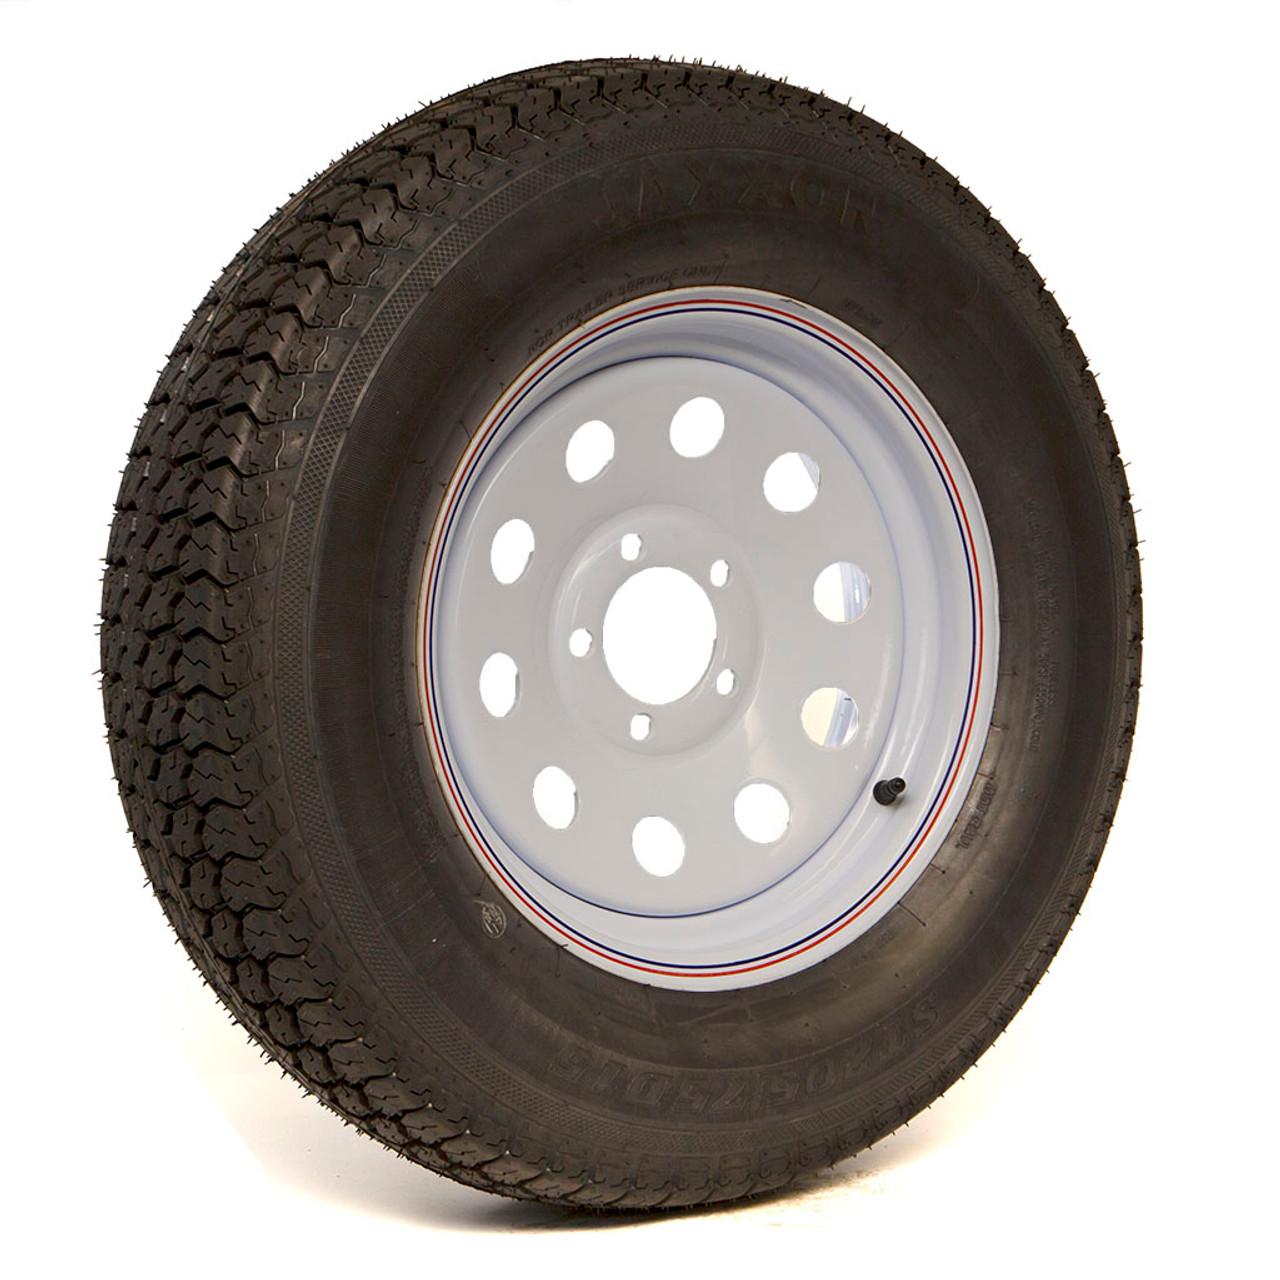 Bias Ply 205/75D15C Tire on a 5 Hole White Mod Wheel